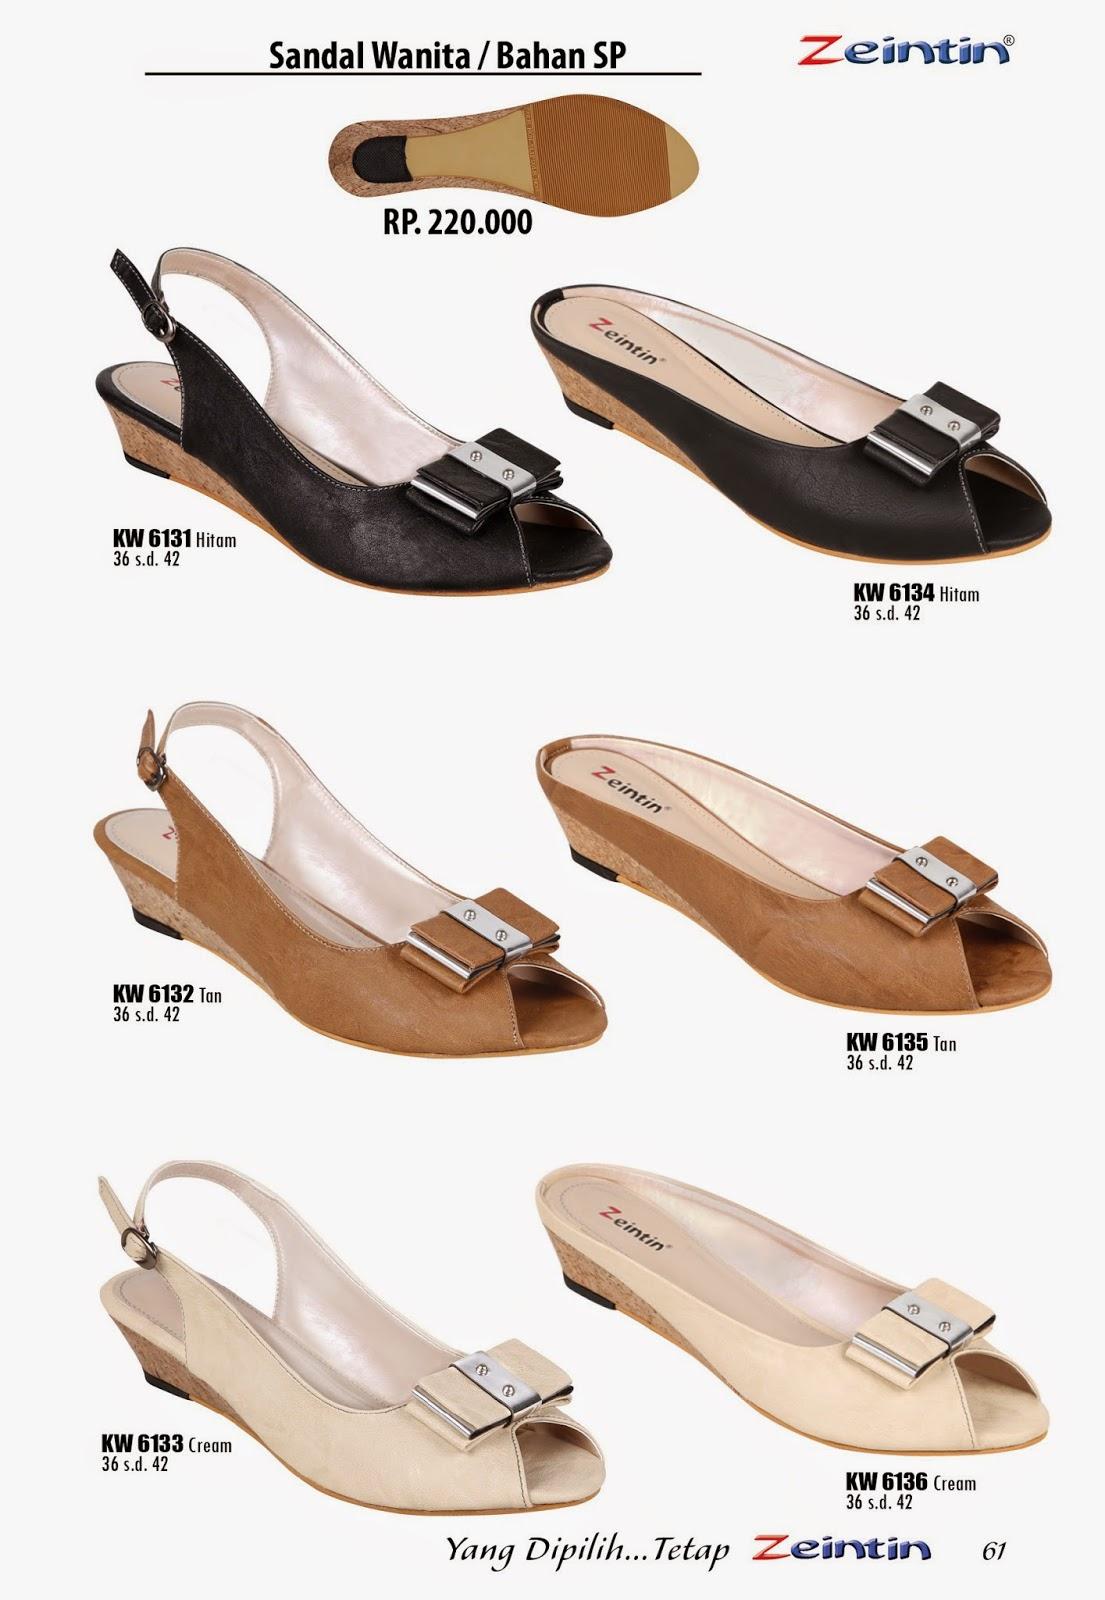 Sandal Wanita Zeintin Katalog Edisi Brilian 11